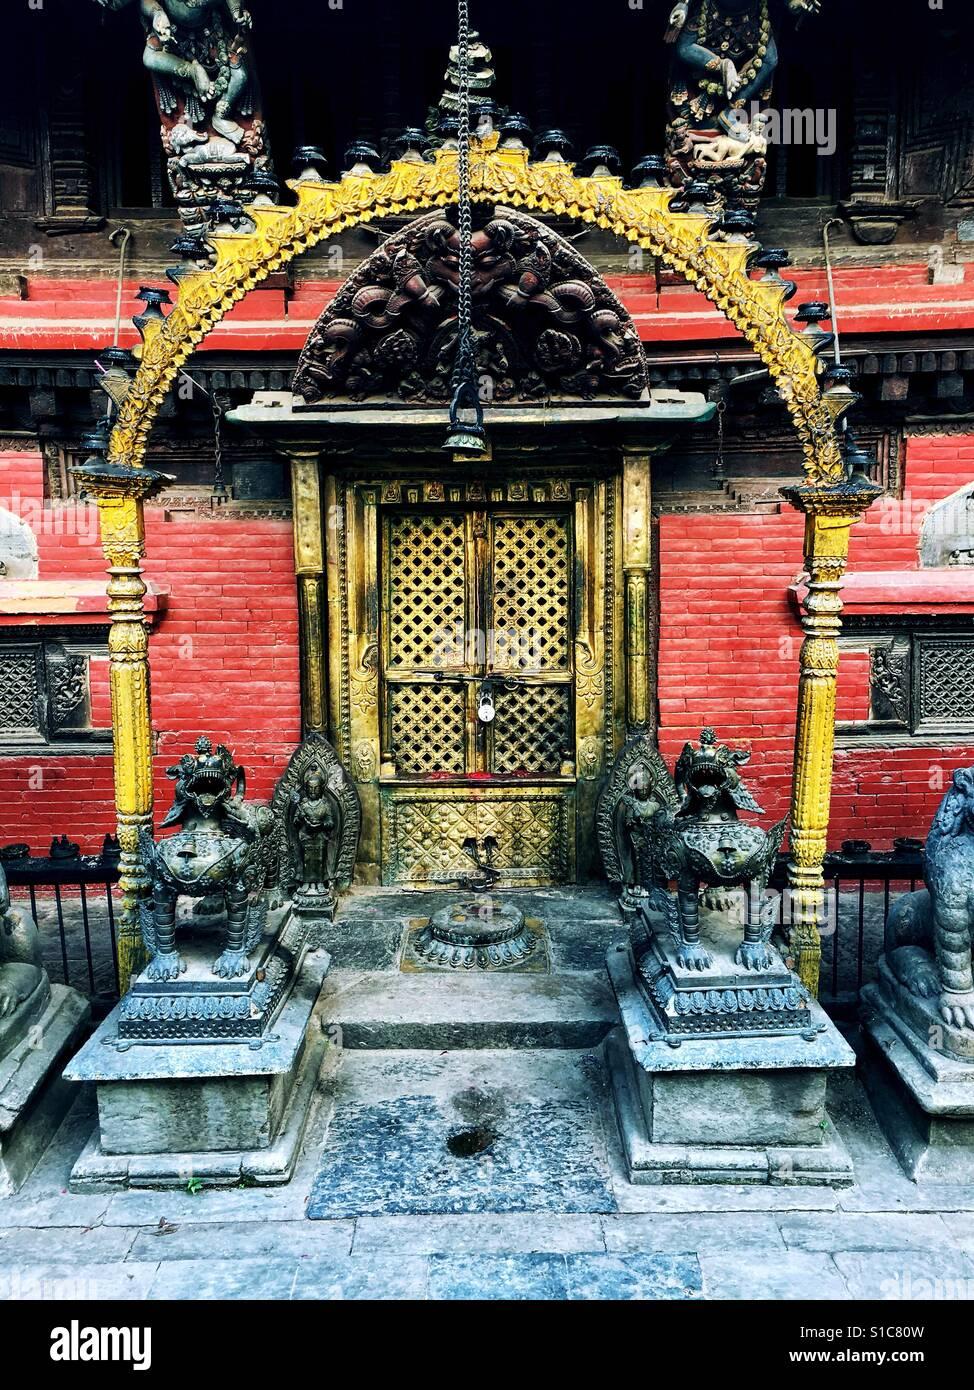 Temple in Kathmandu, Nepal - Stock Image